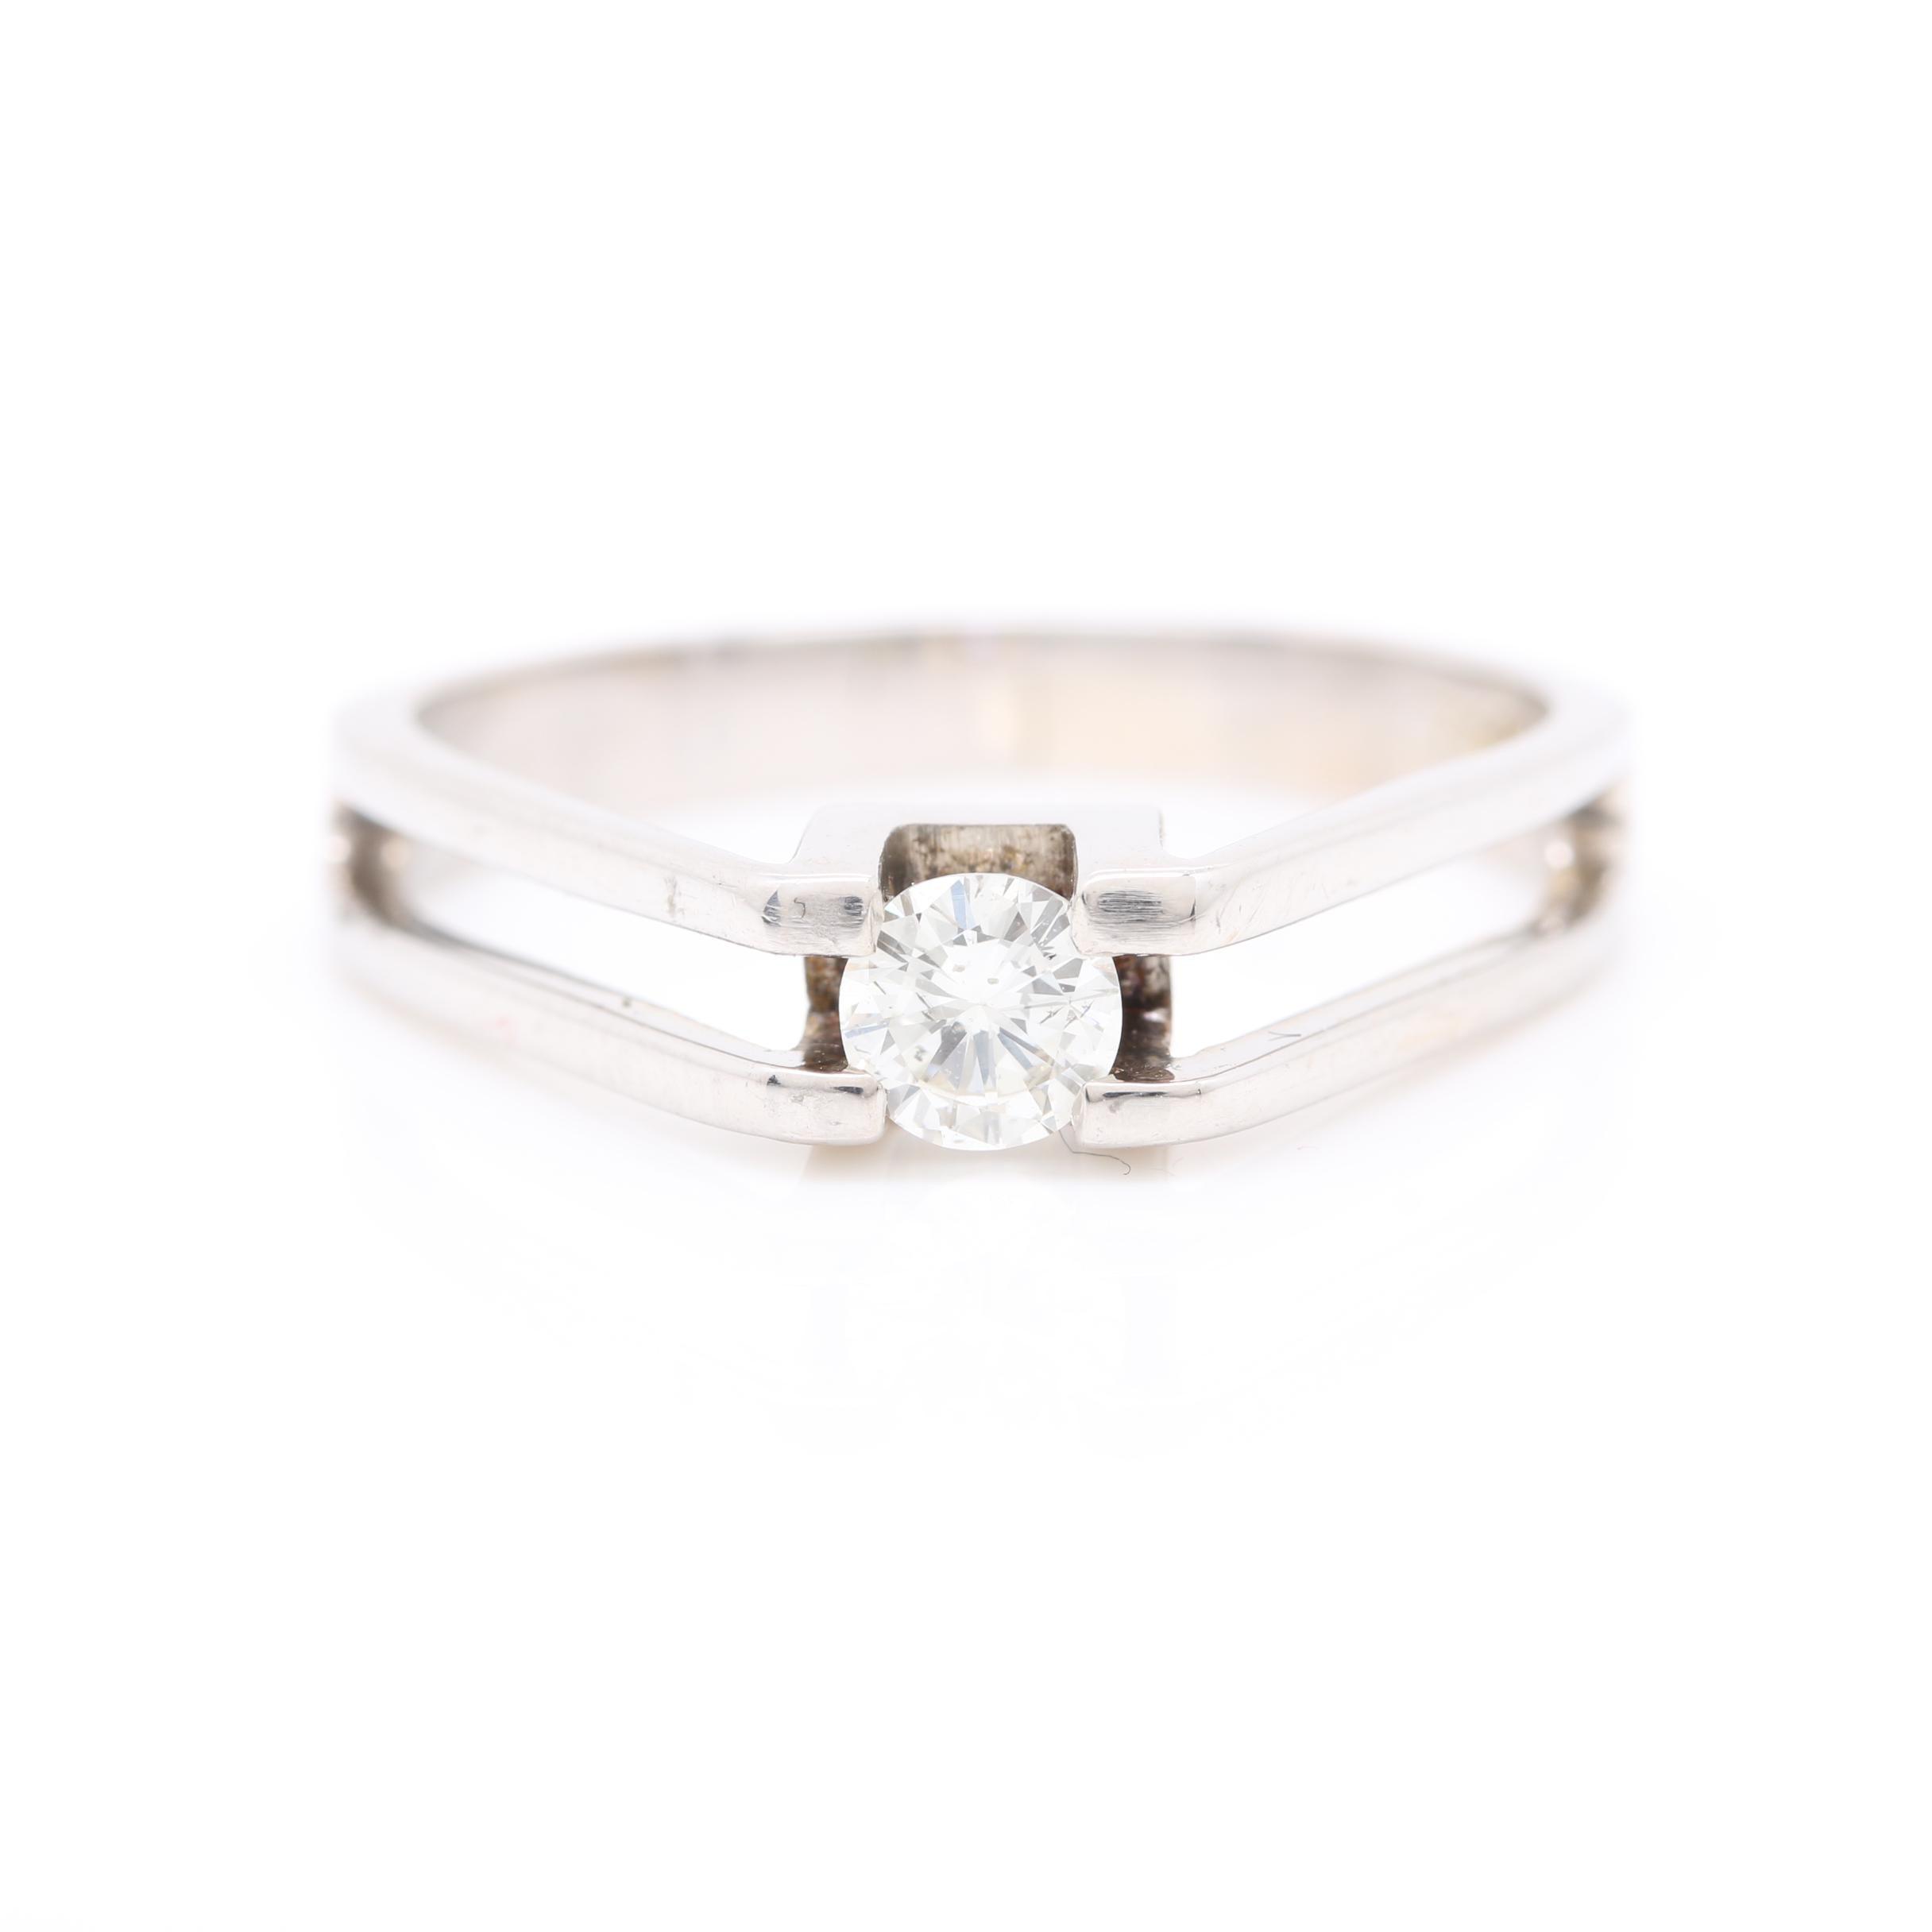 18K White Gold Diamond Solitaire Ring